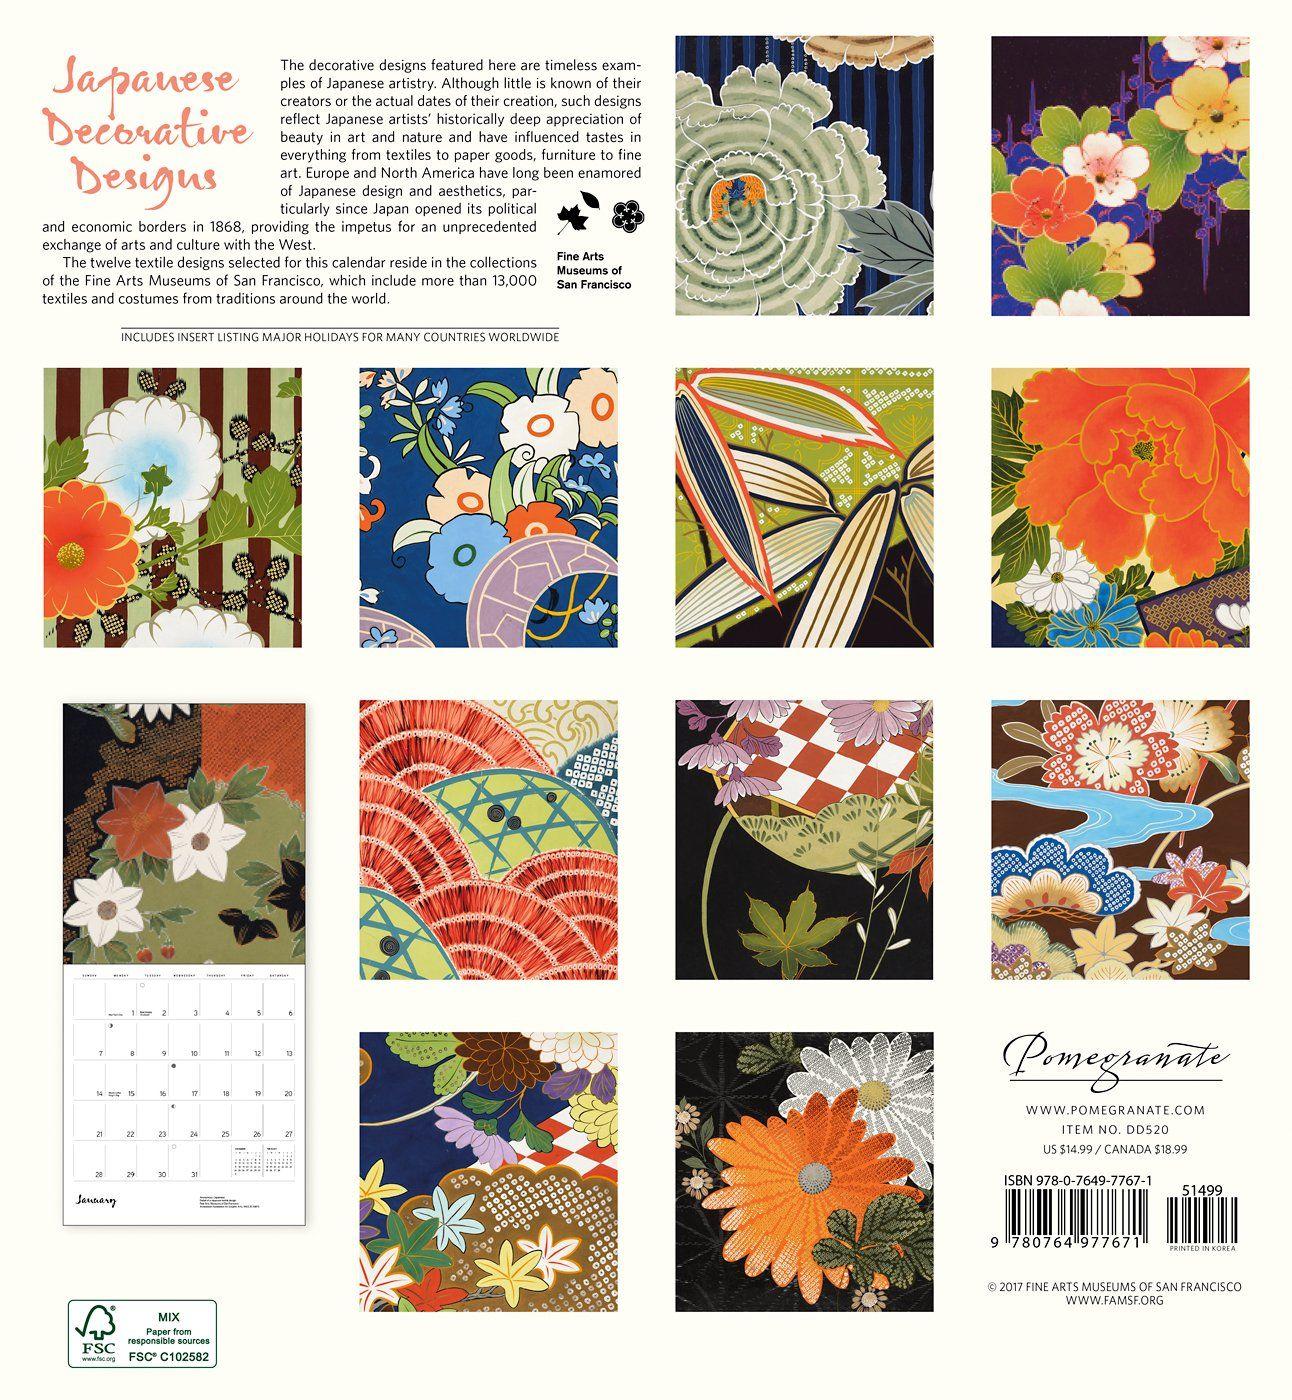 Japanese Decorative Designs 2018 Wall Calendar #calendar #design ...